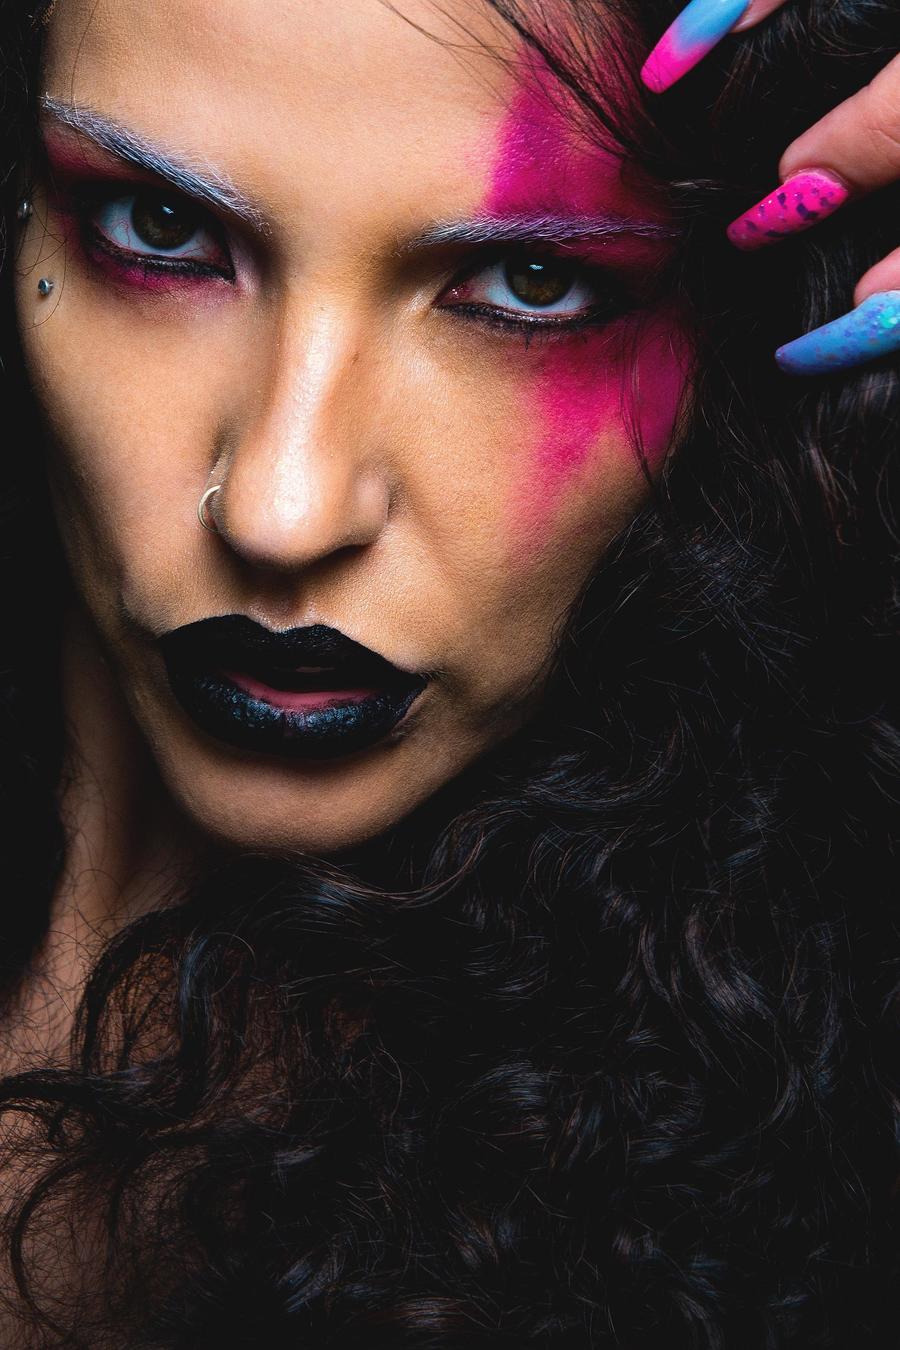 CHILLI / Makeup by RoosJames, Taken at Studio X / Uploaded 1st November 2018 @ 08:58 PM